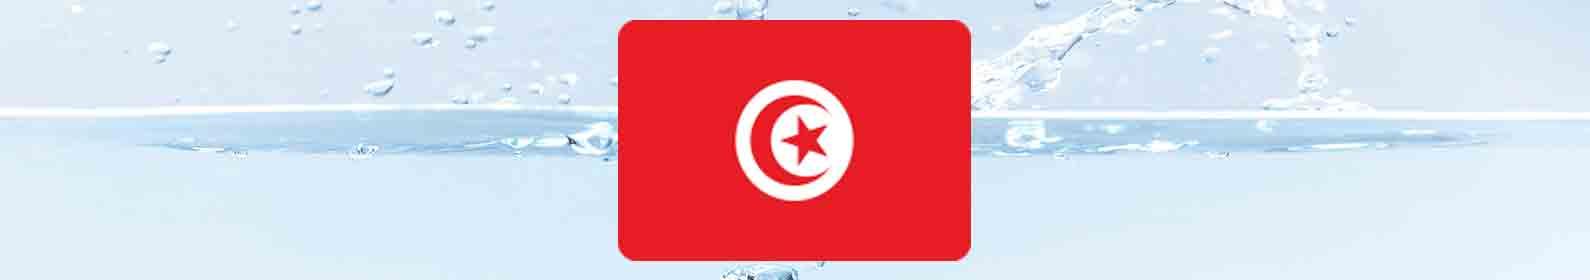 water-treatment-tunisia.jpg